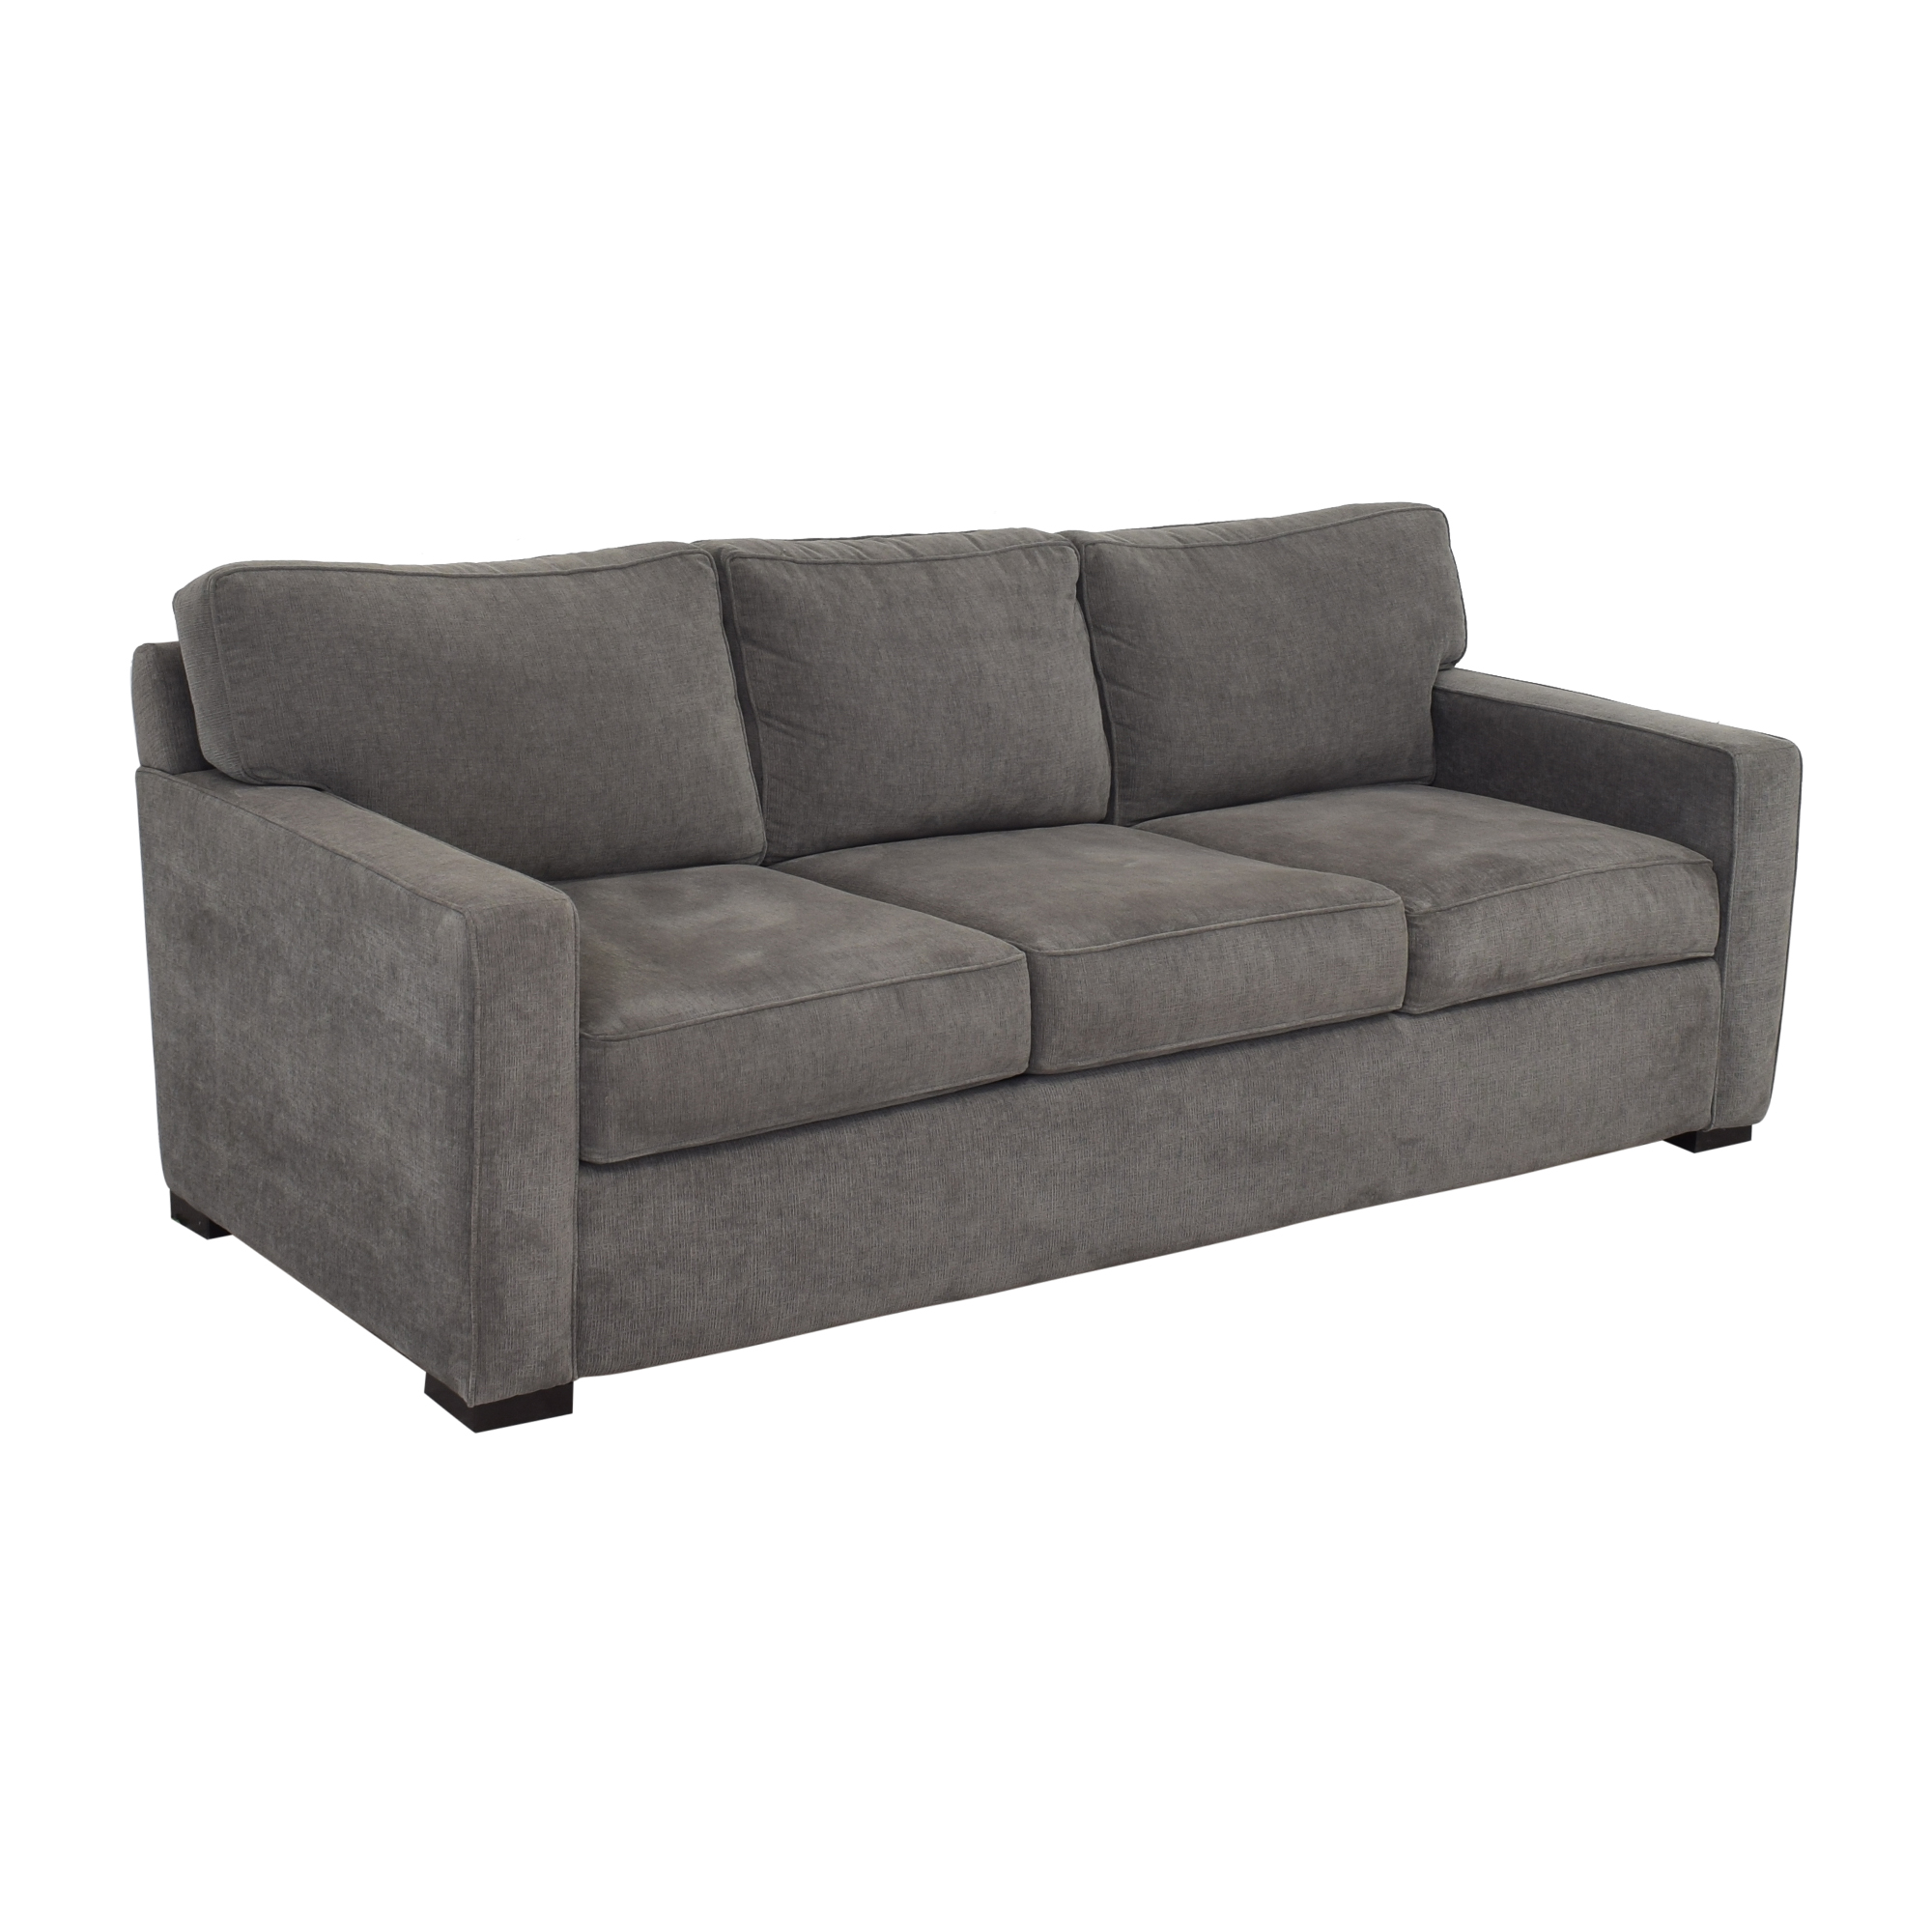 Macy's Macy's Radley Fabric Sofa dimensions